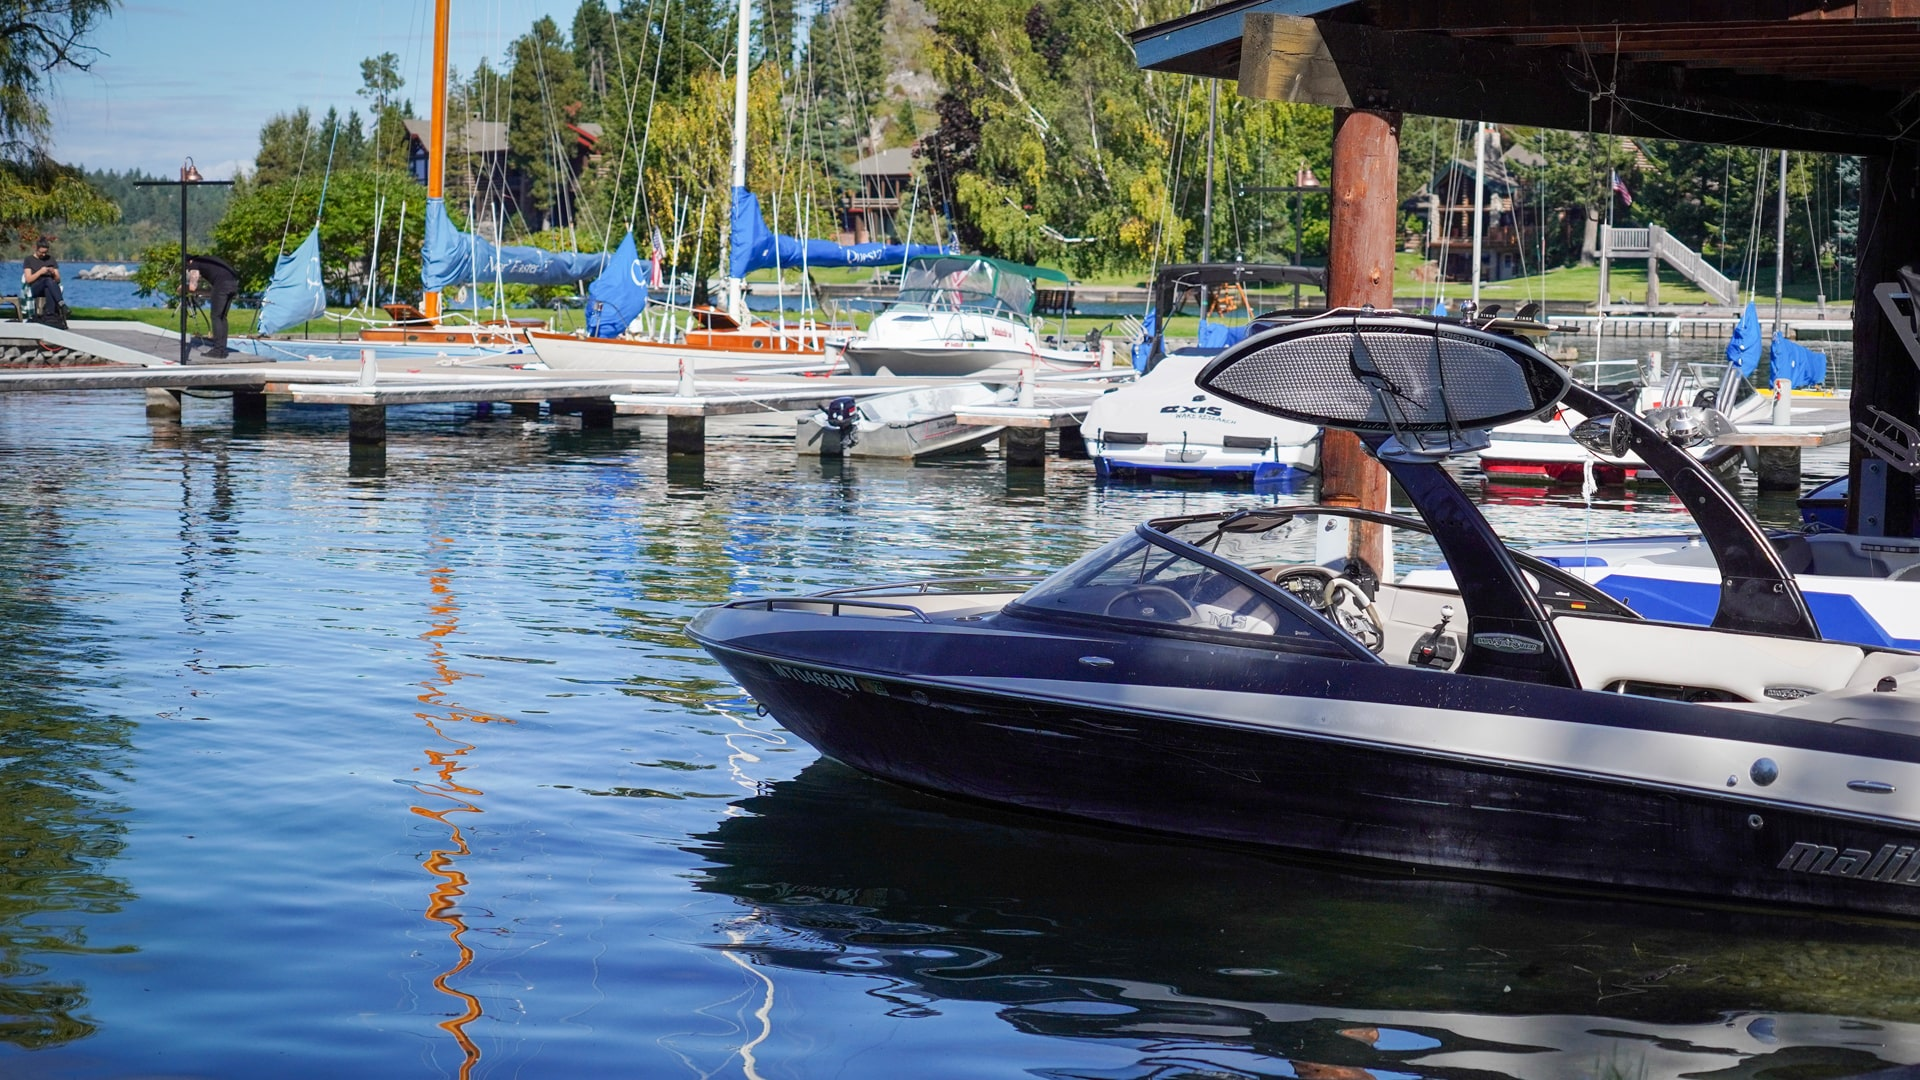 R19-Sony-Camera-Camp-2019-Flathead-Lake-Lodge-Boat-Dock-1920x1080.jpg